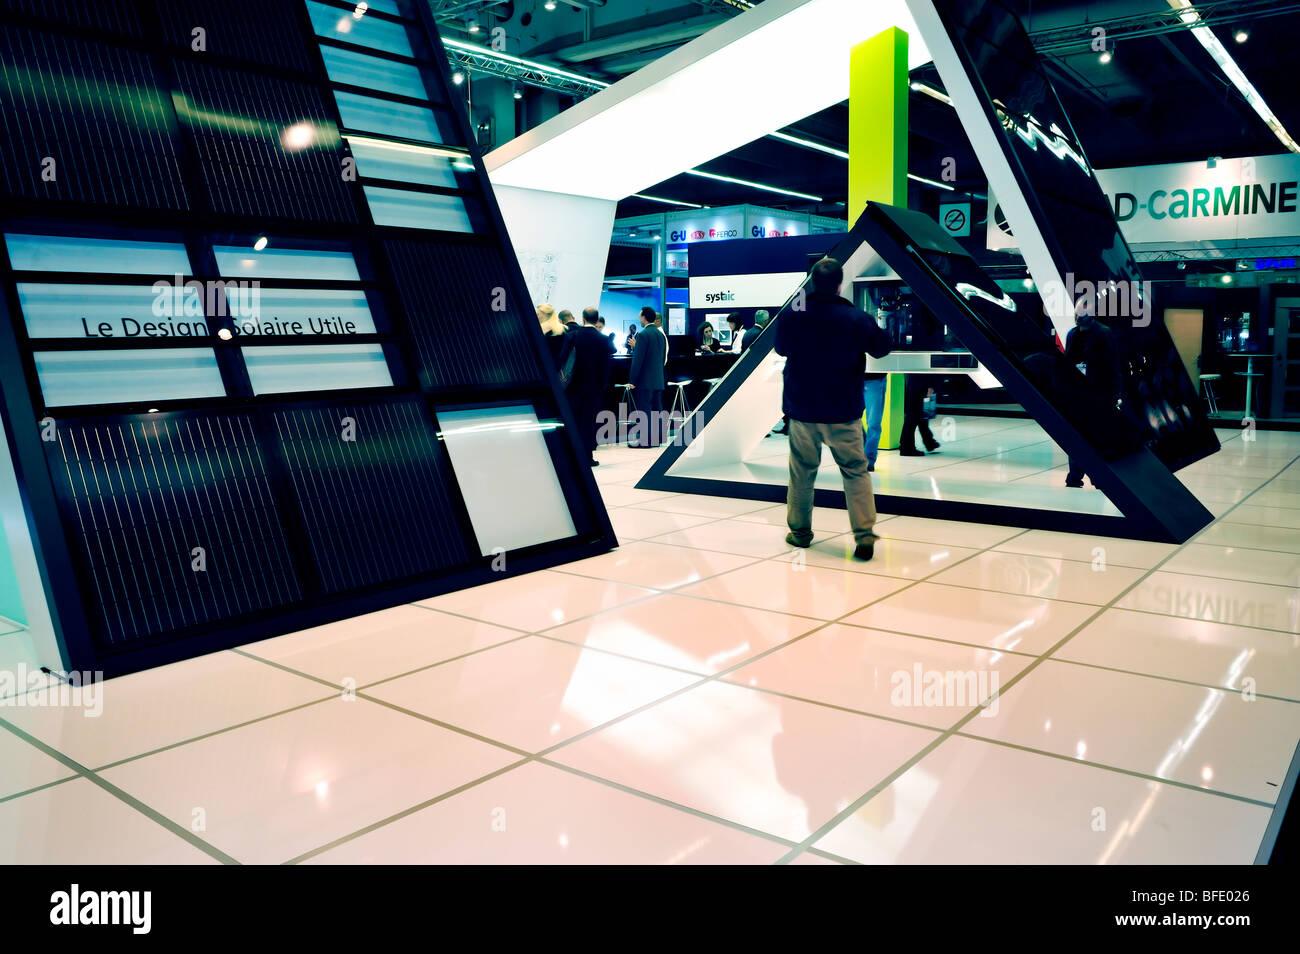 Paris, France, Construction Equipment Trade Show, Solar Energy Panels, Company display, Concept Model - Stock Image